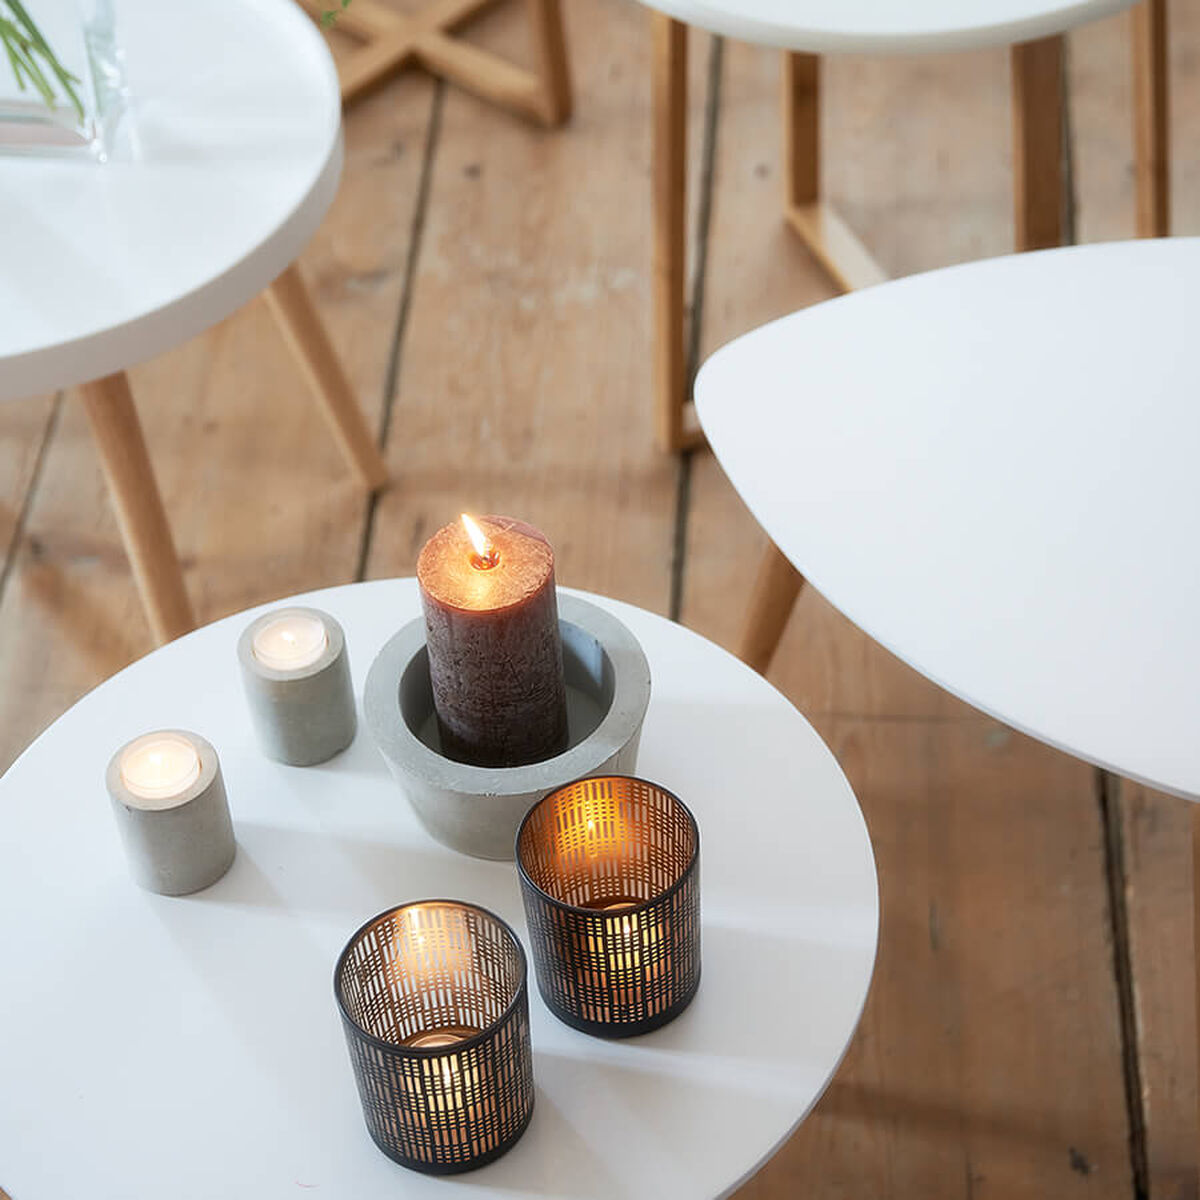 deko geschenke online kaufen butlers. Black Bedroom Furniture Sets. Home Design Ideas